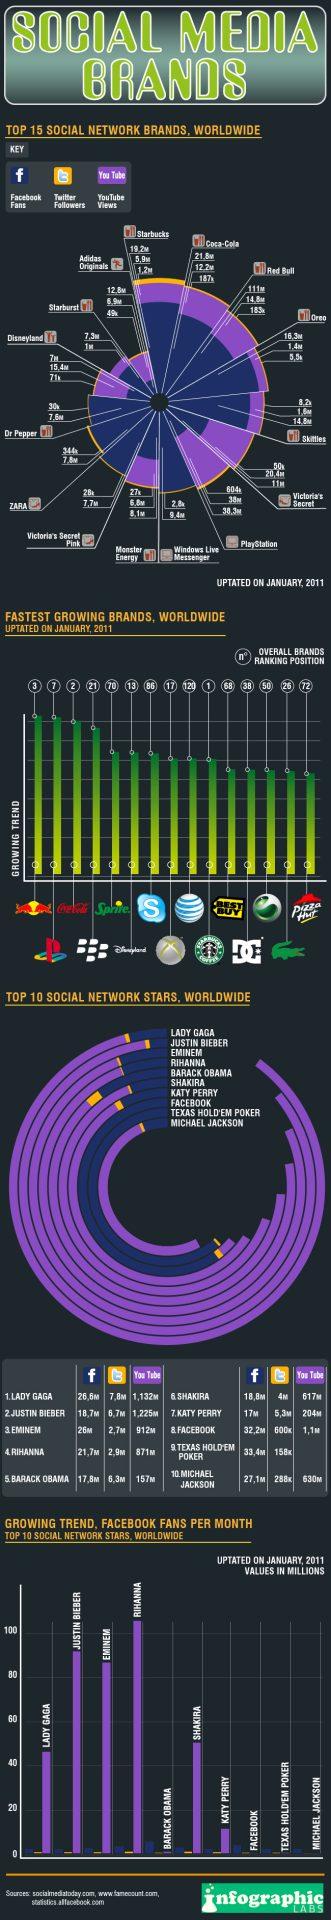 Top Social Media Brands: Infographic